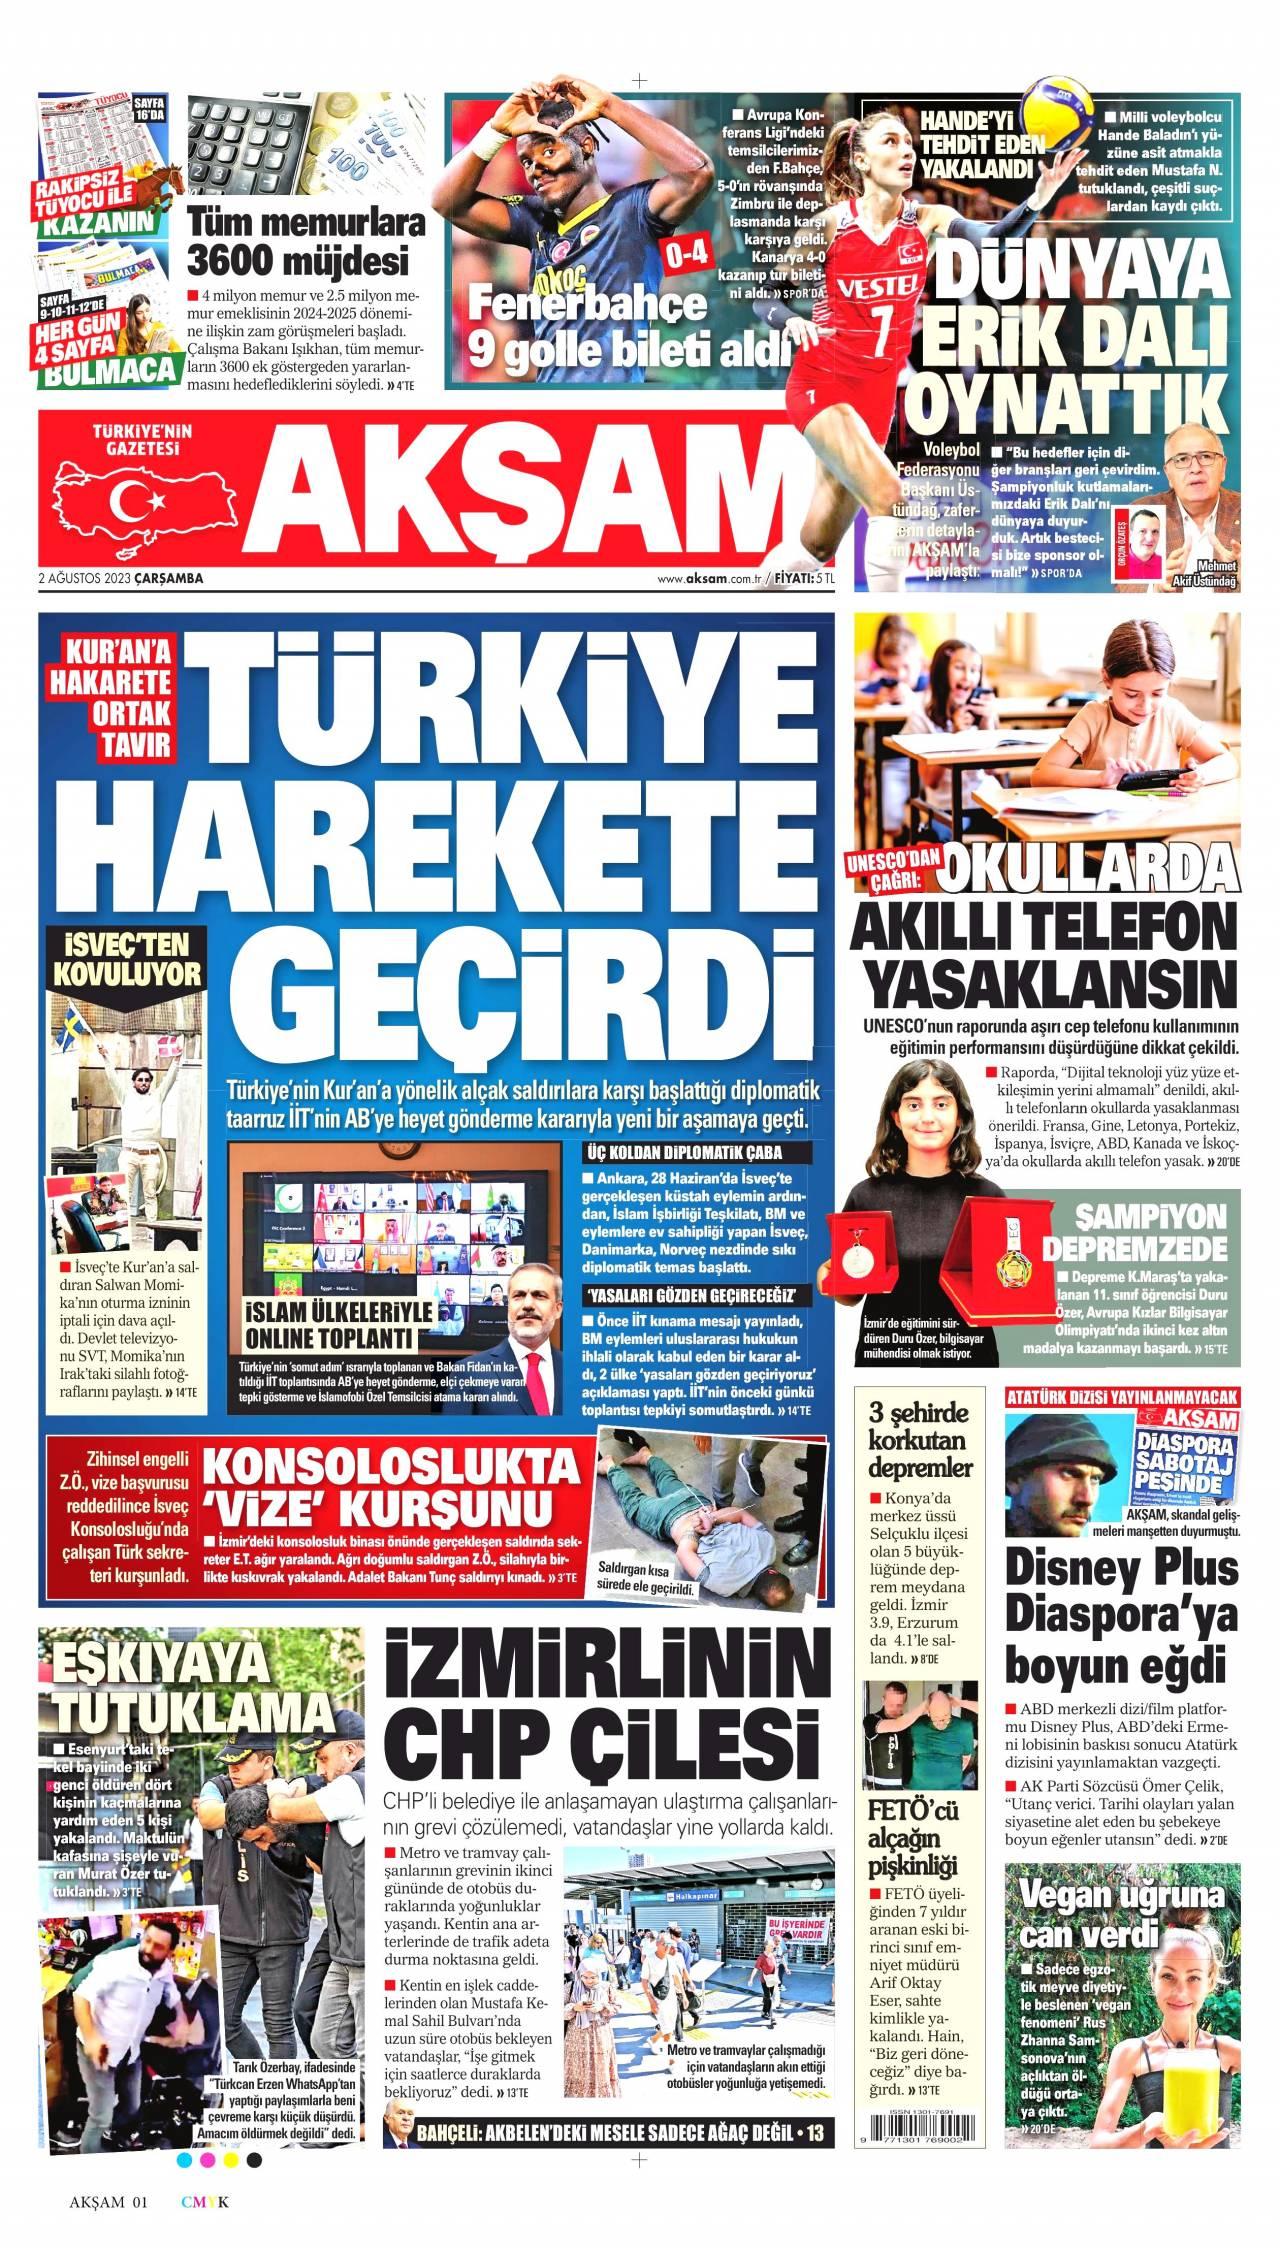 Gazete Manşetleri 4 Nisan 2019 Perşembe Kdz Ereğli Haber